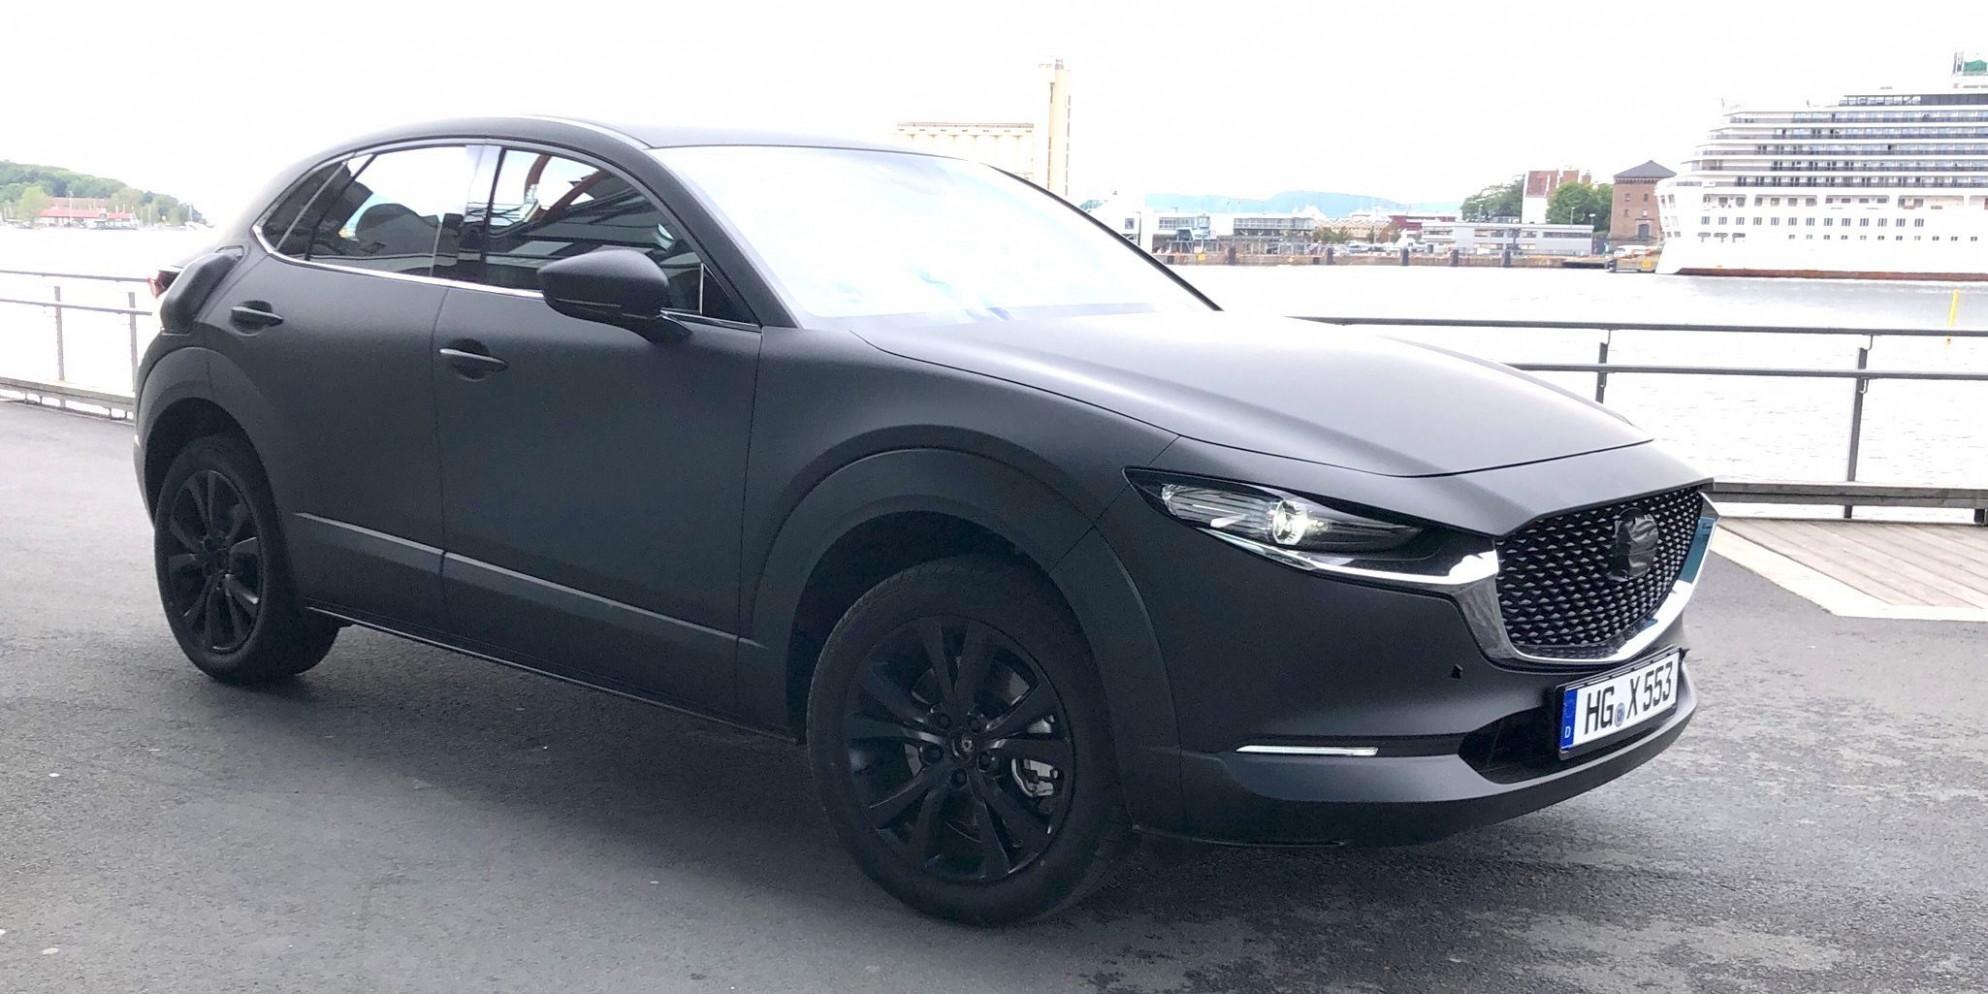 Specs Mazda Electric Car 2022